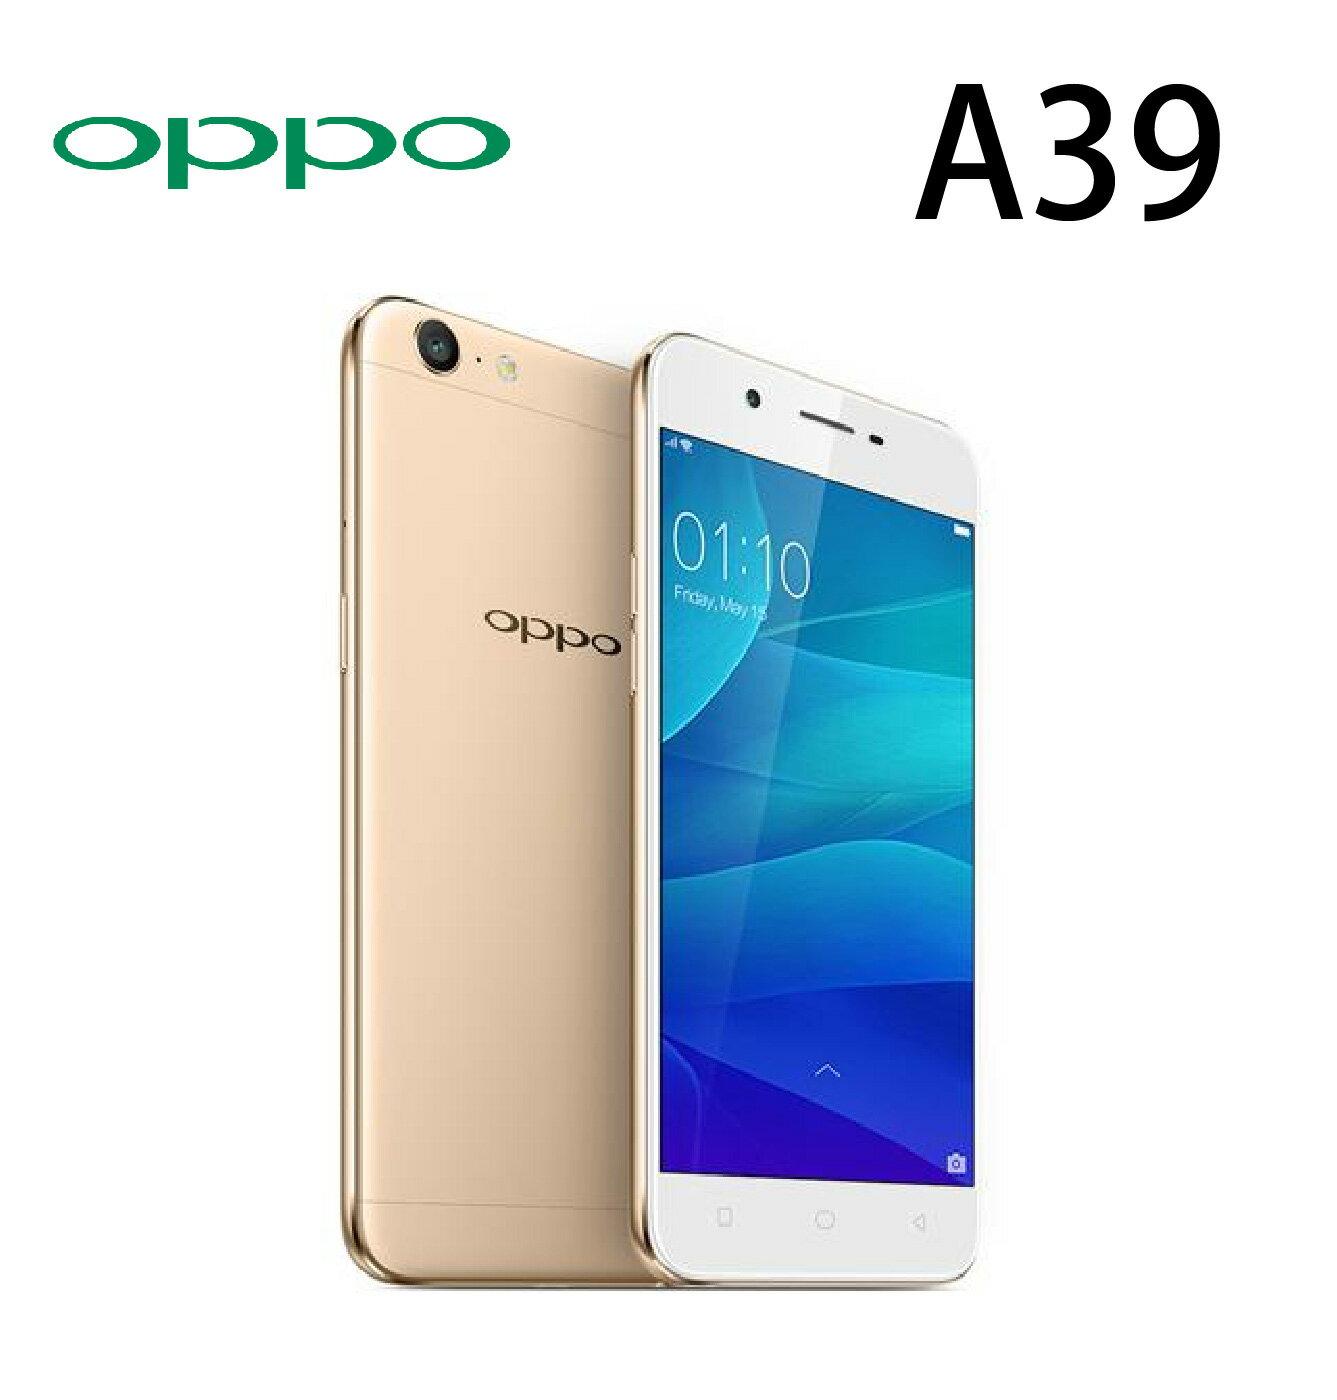 OPPO A39/愛自拍 無止盡 攜碼/新辦/續約台灣大哥大電信門號專案 手機最低1元